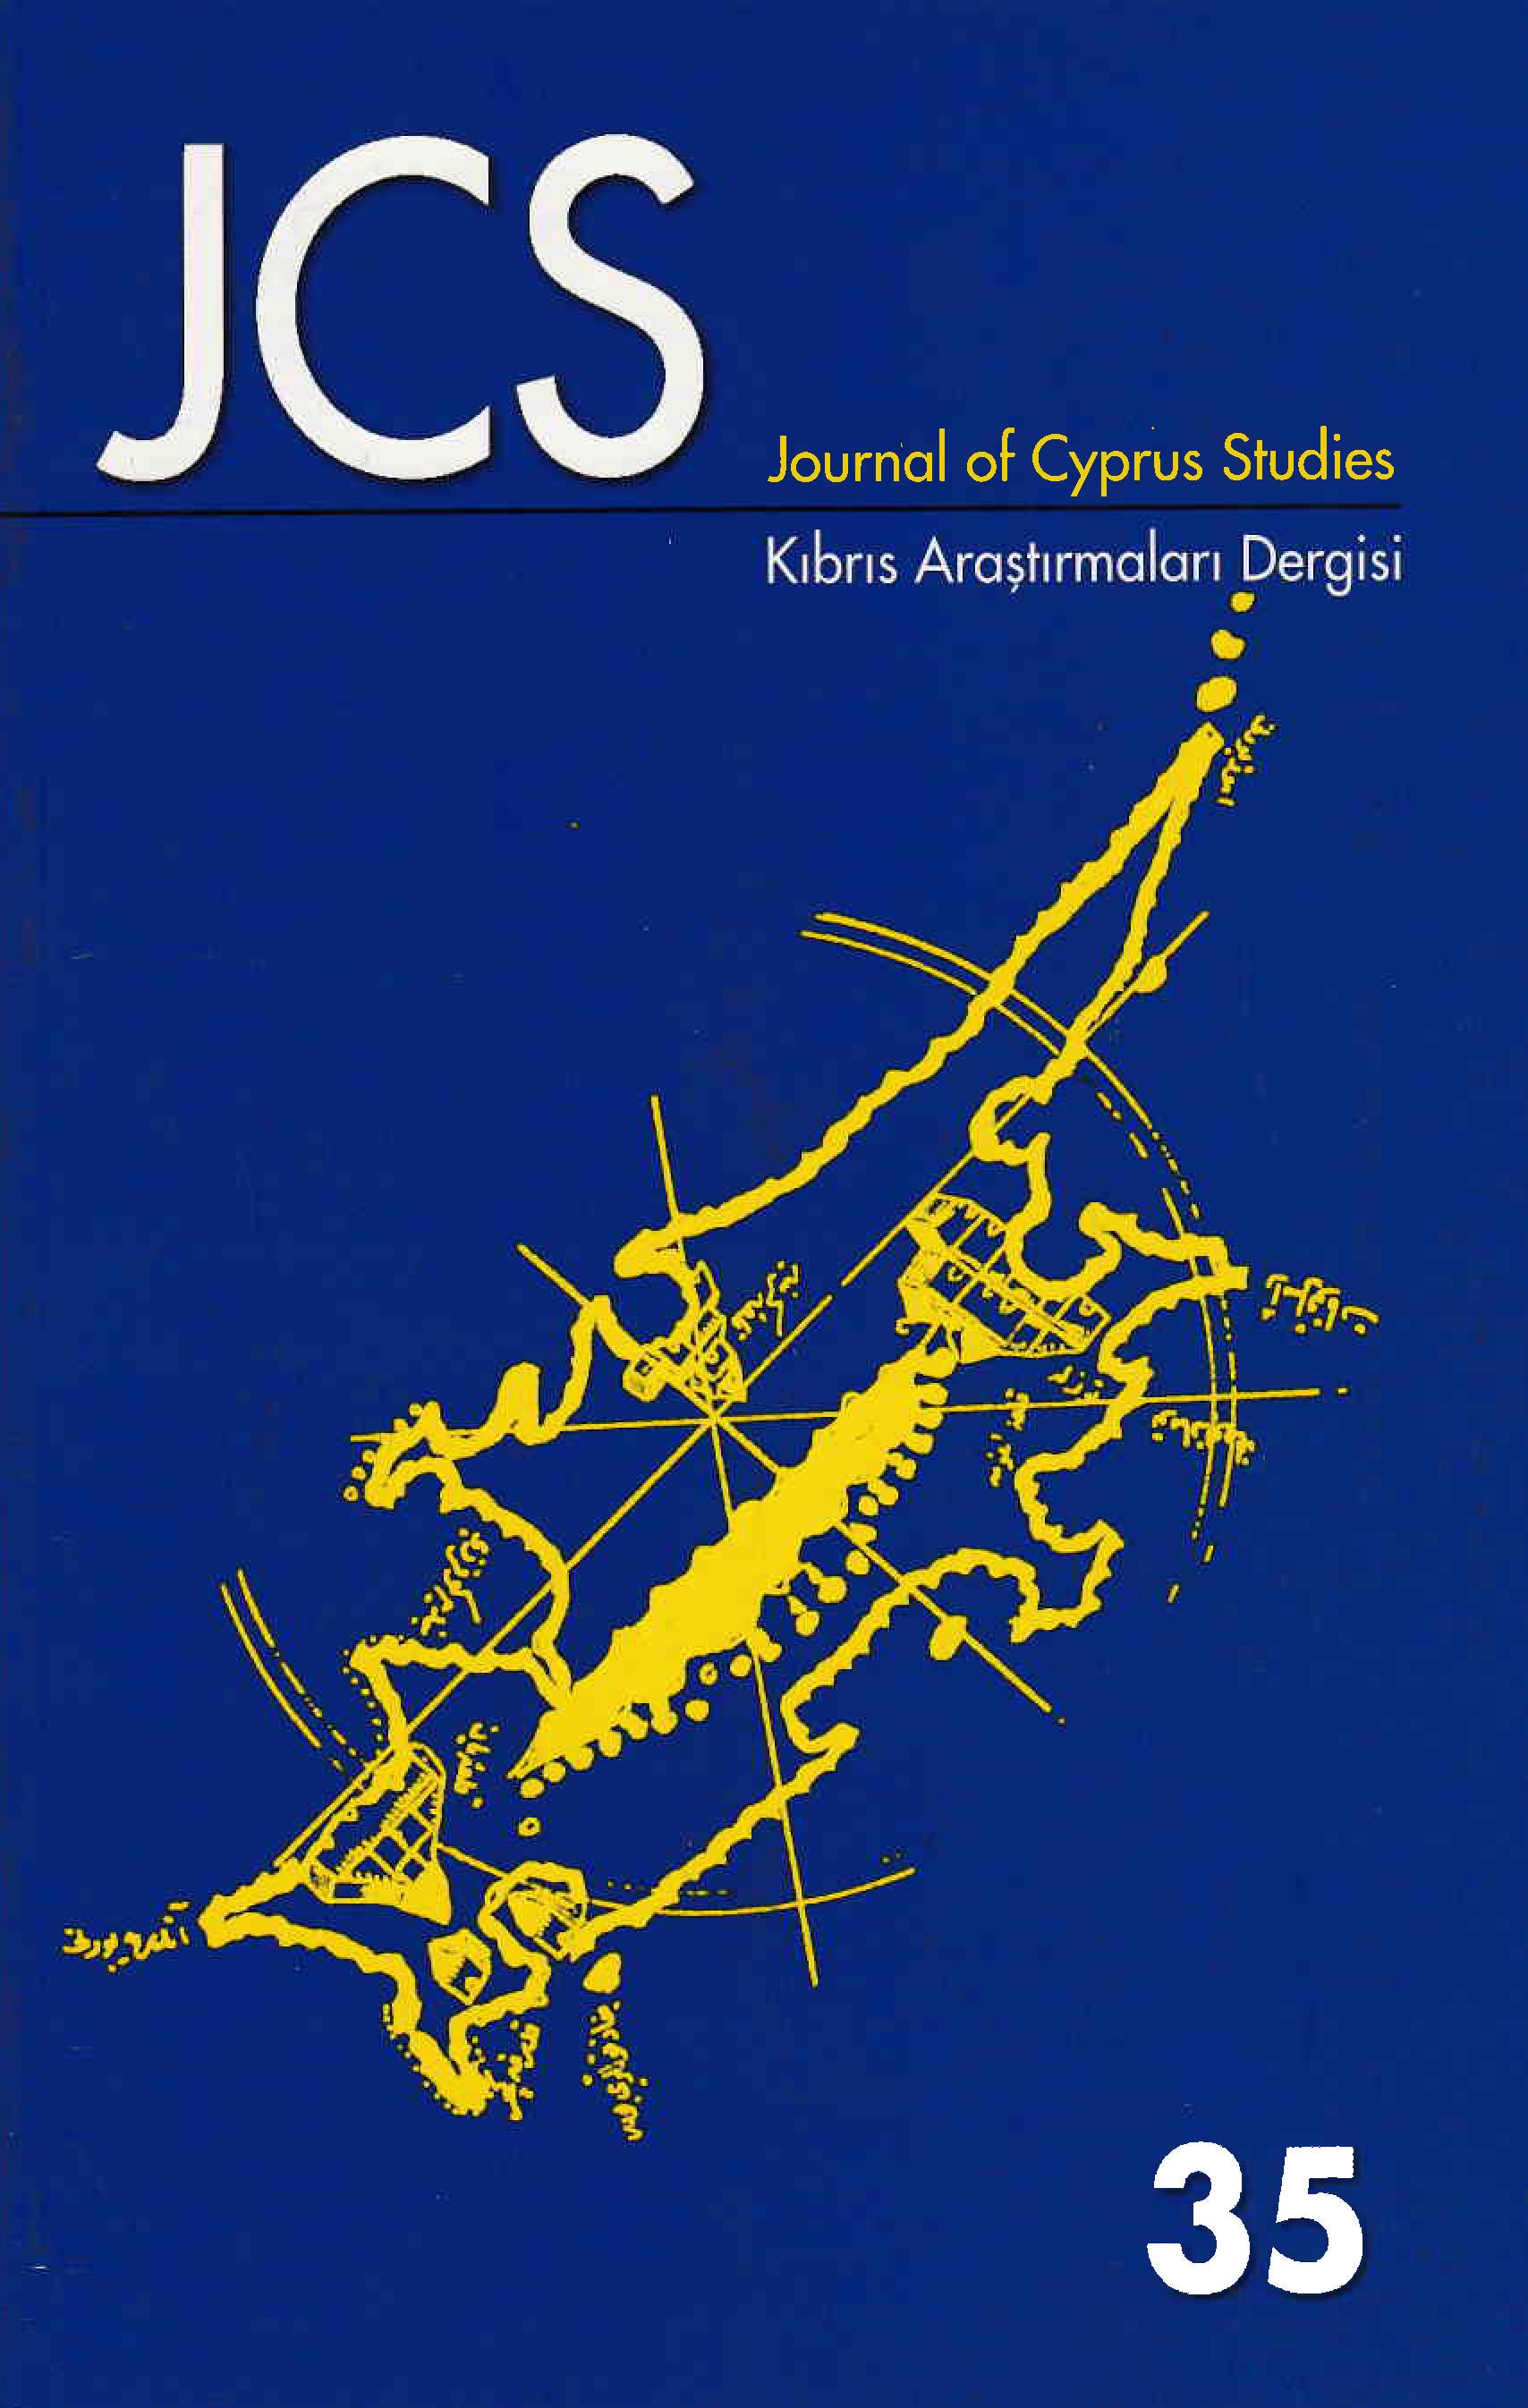 View Vol. 14 No. 35 (2008): Journal of Cyprus Studies